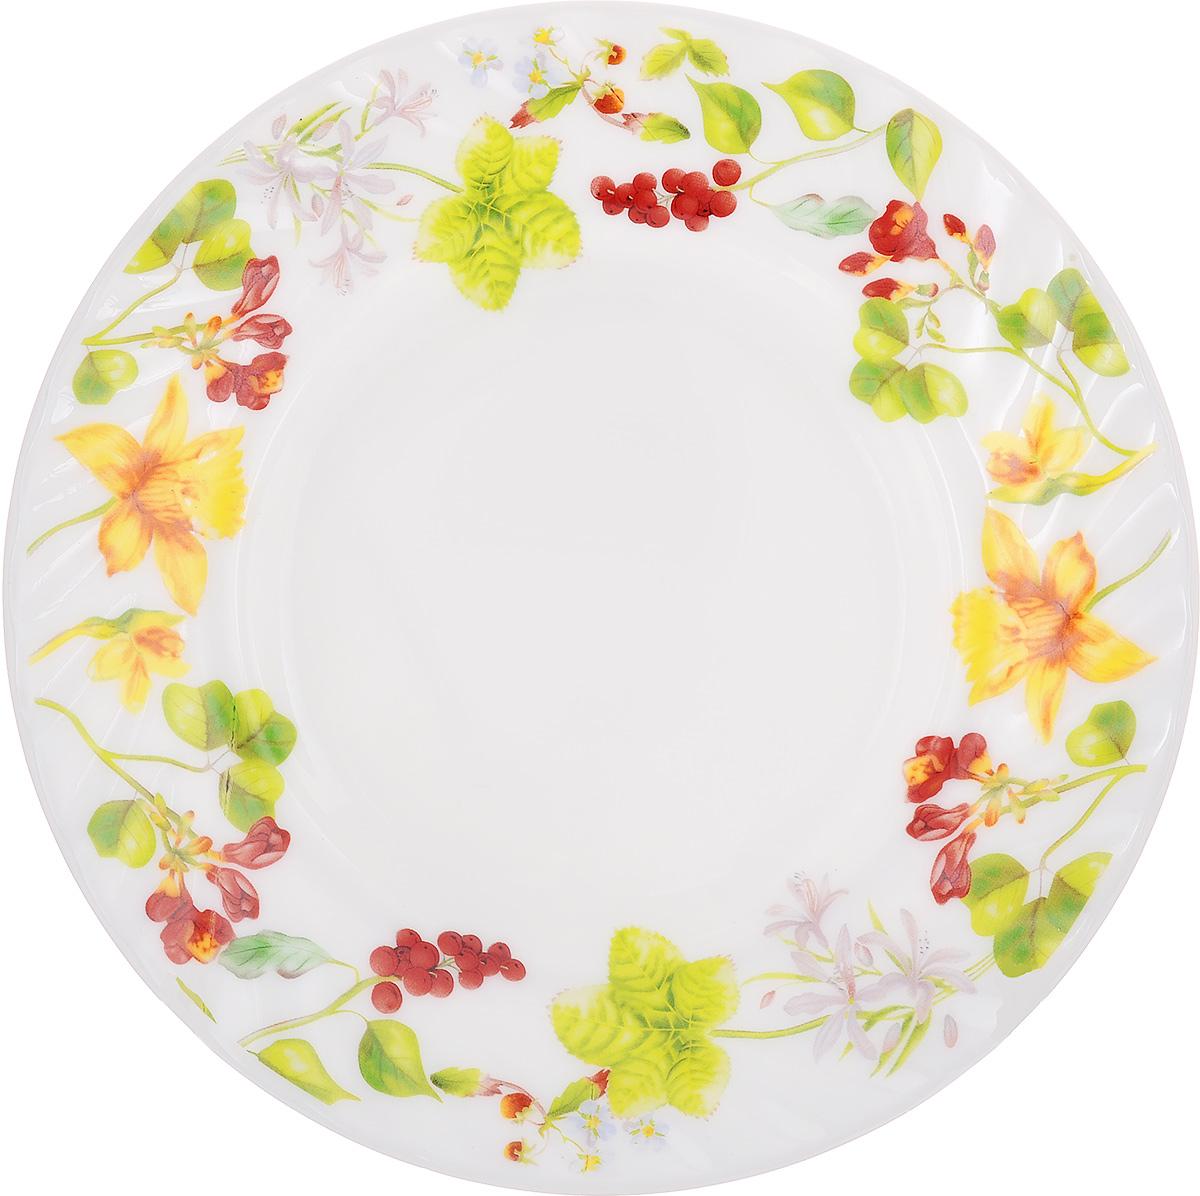 Тарелка обеденная МФК-профит